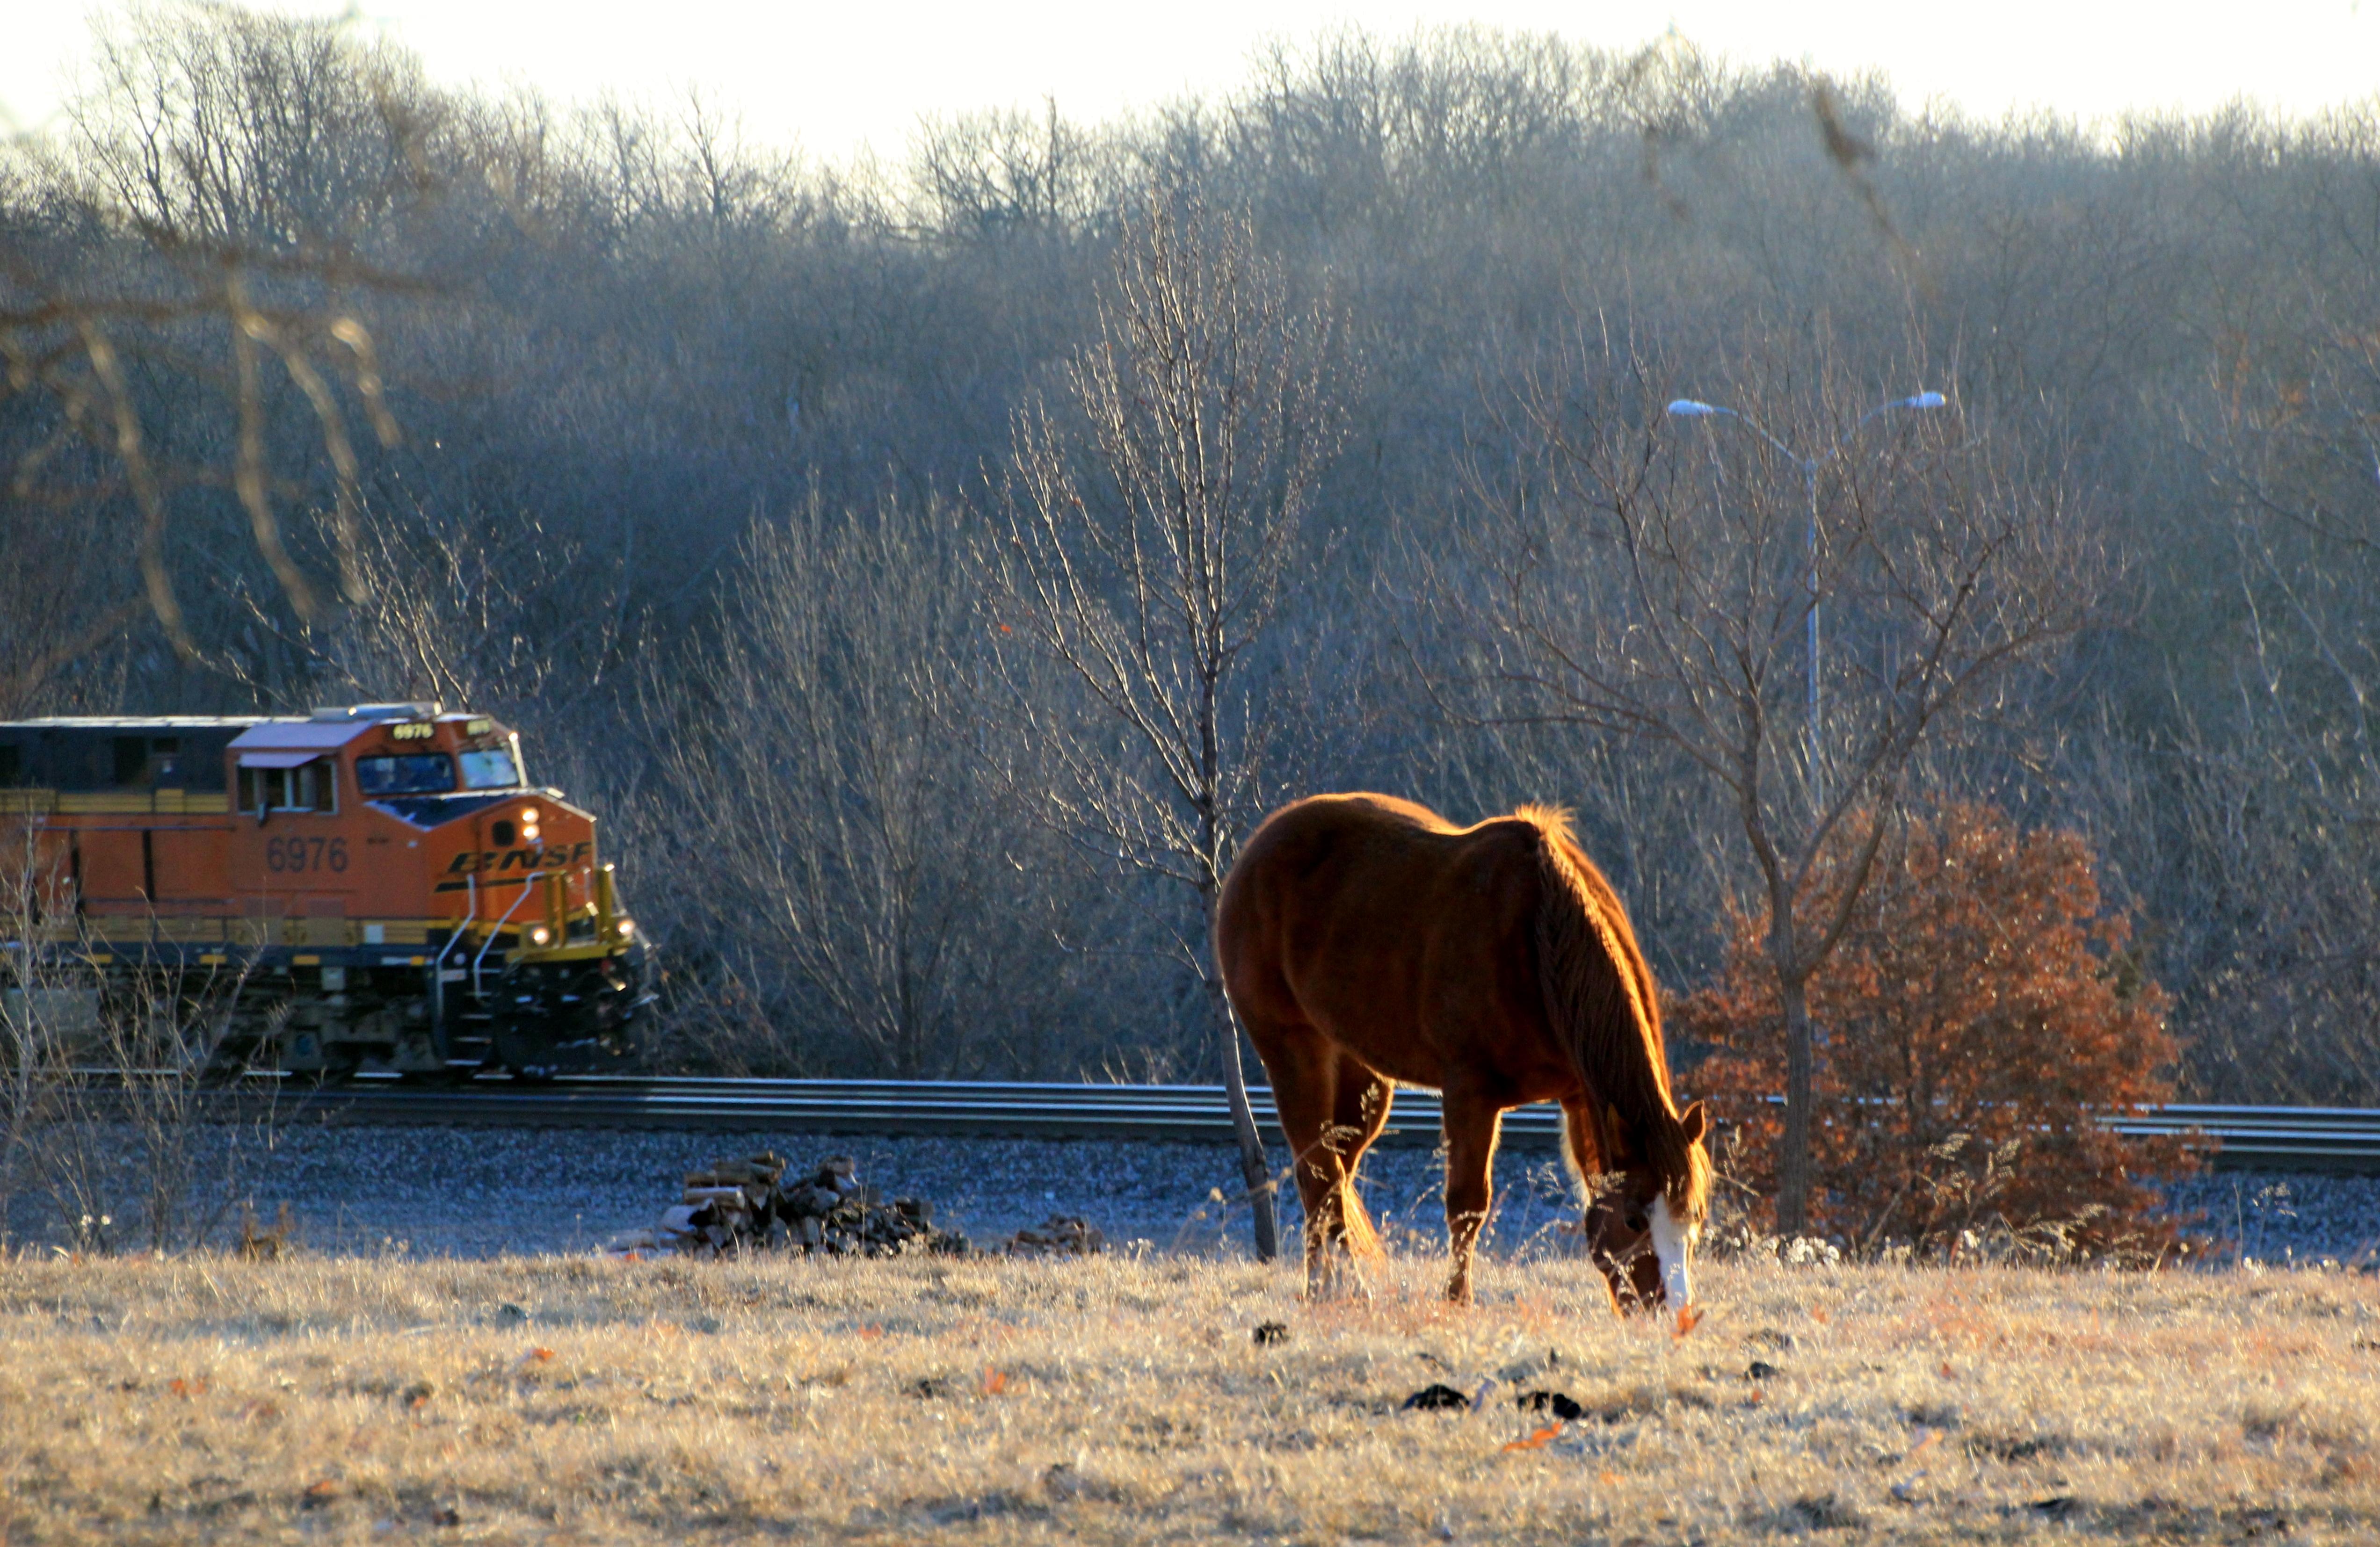 Sunlit Horse 2-26-15 014